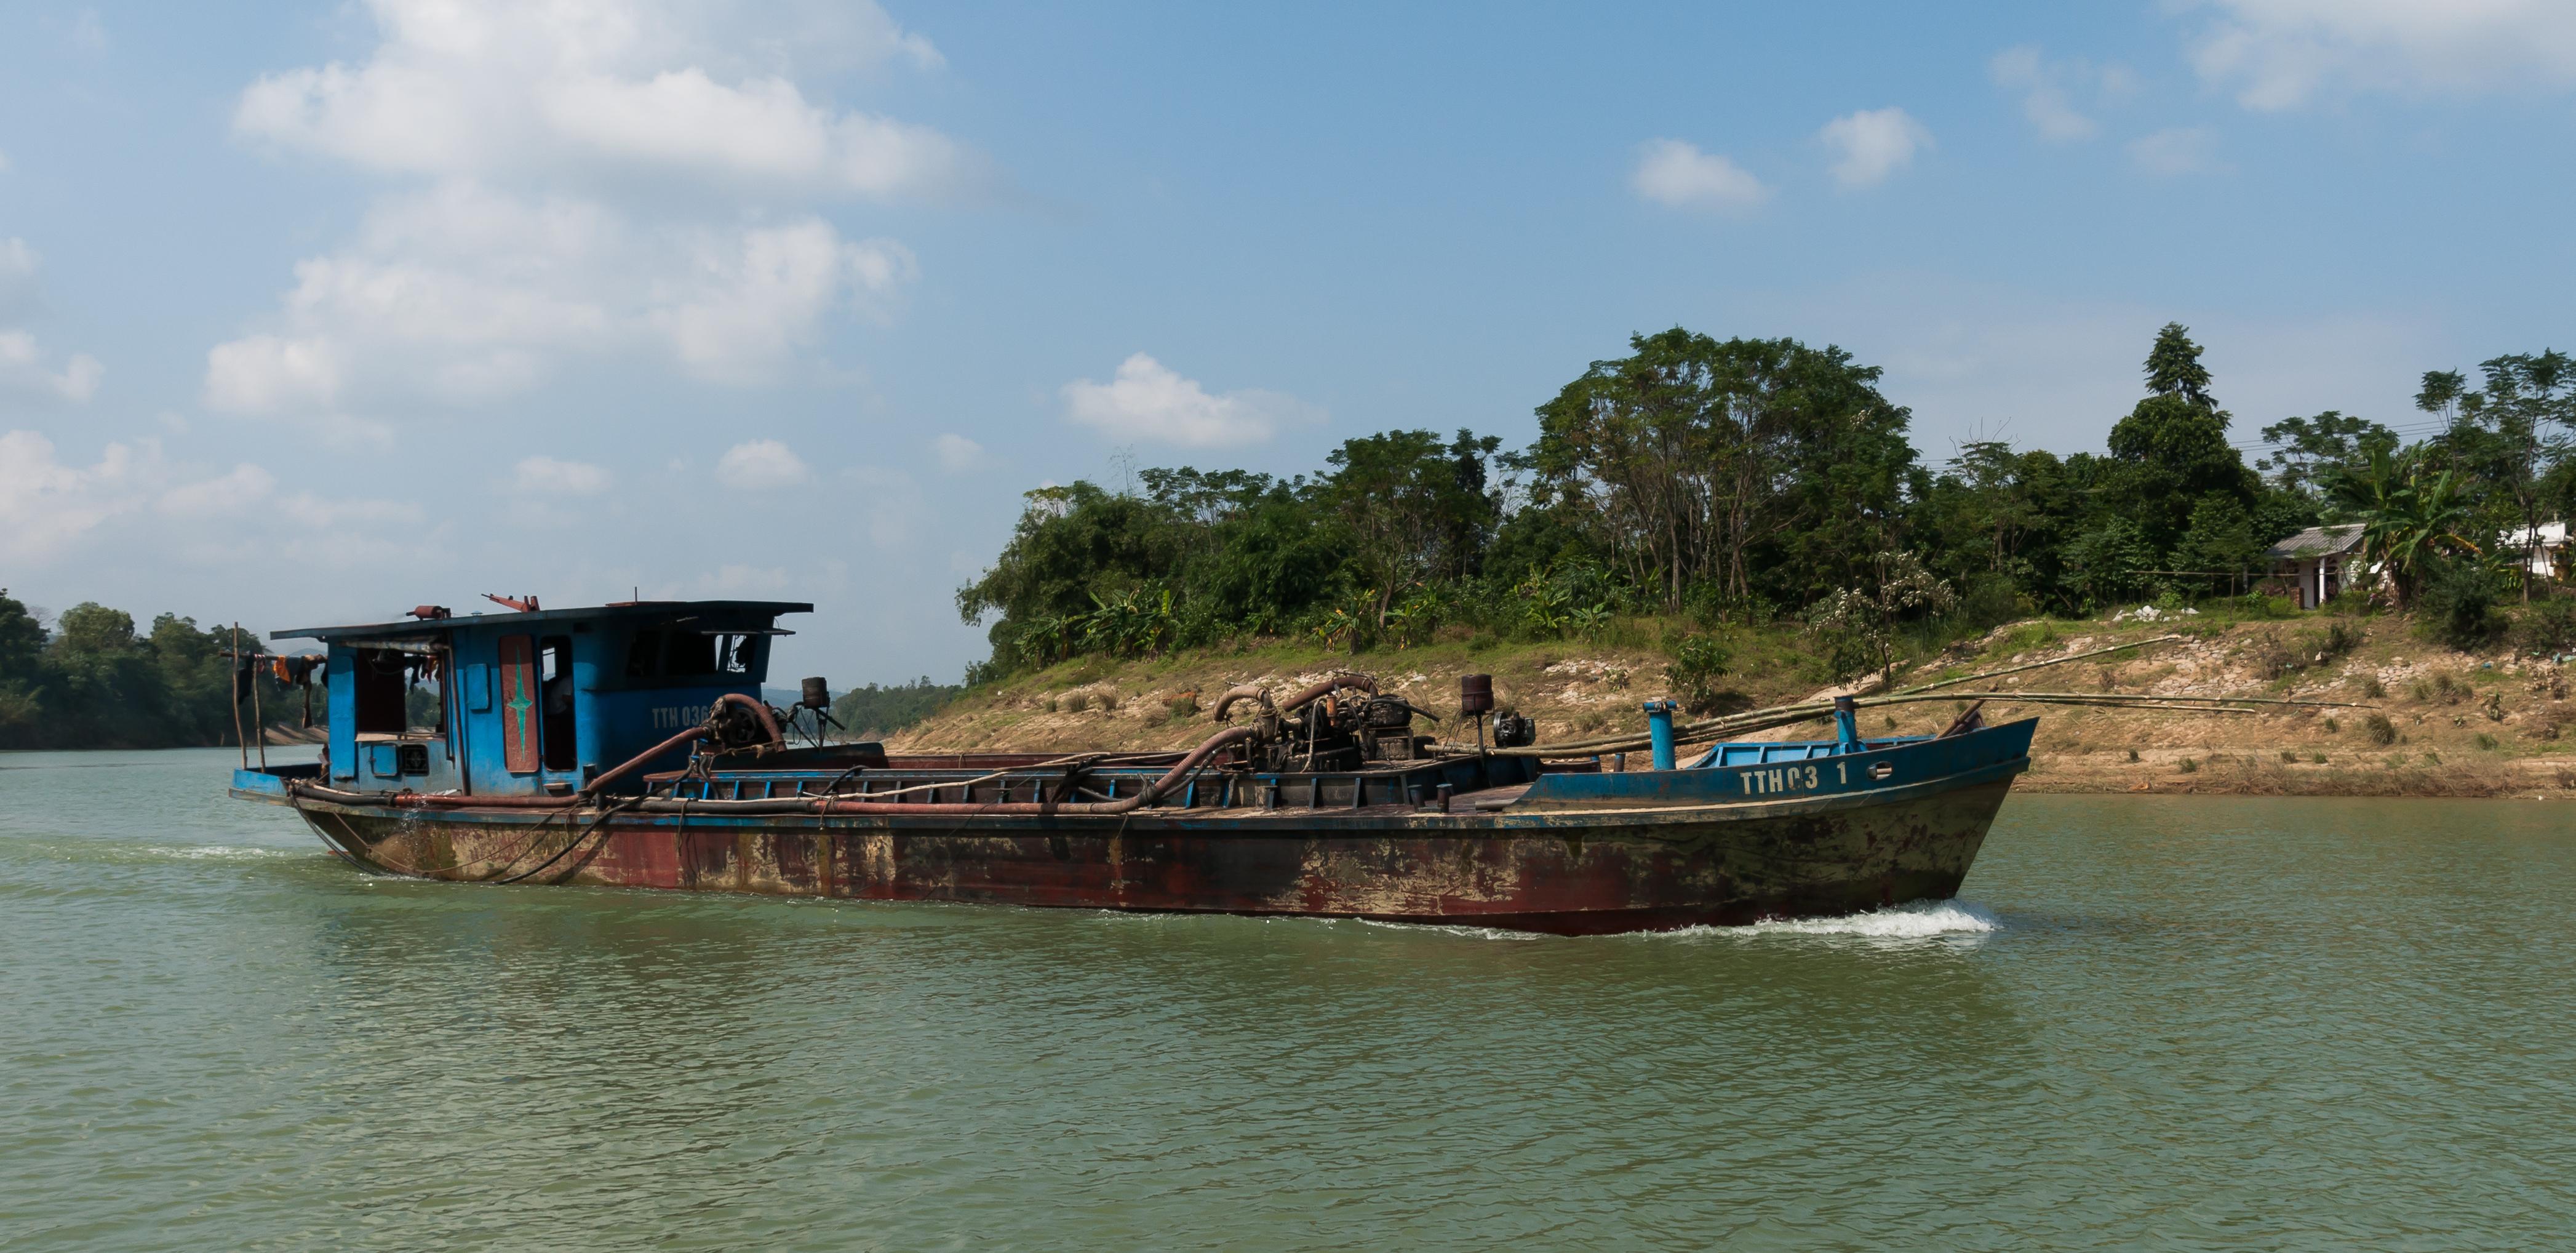 File:Hue Vietnam Freight-ship-on-the-Perfume-River-02.jpg ...